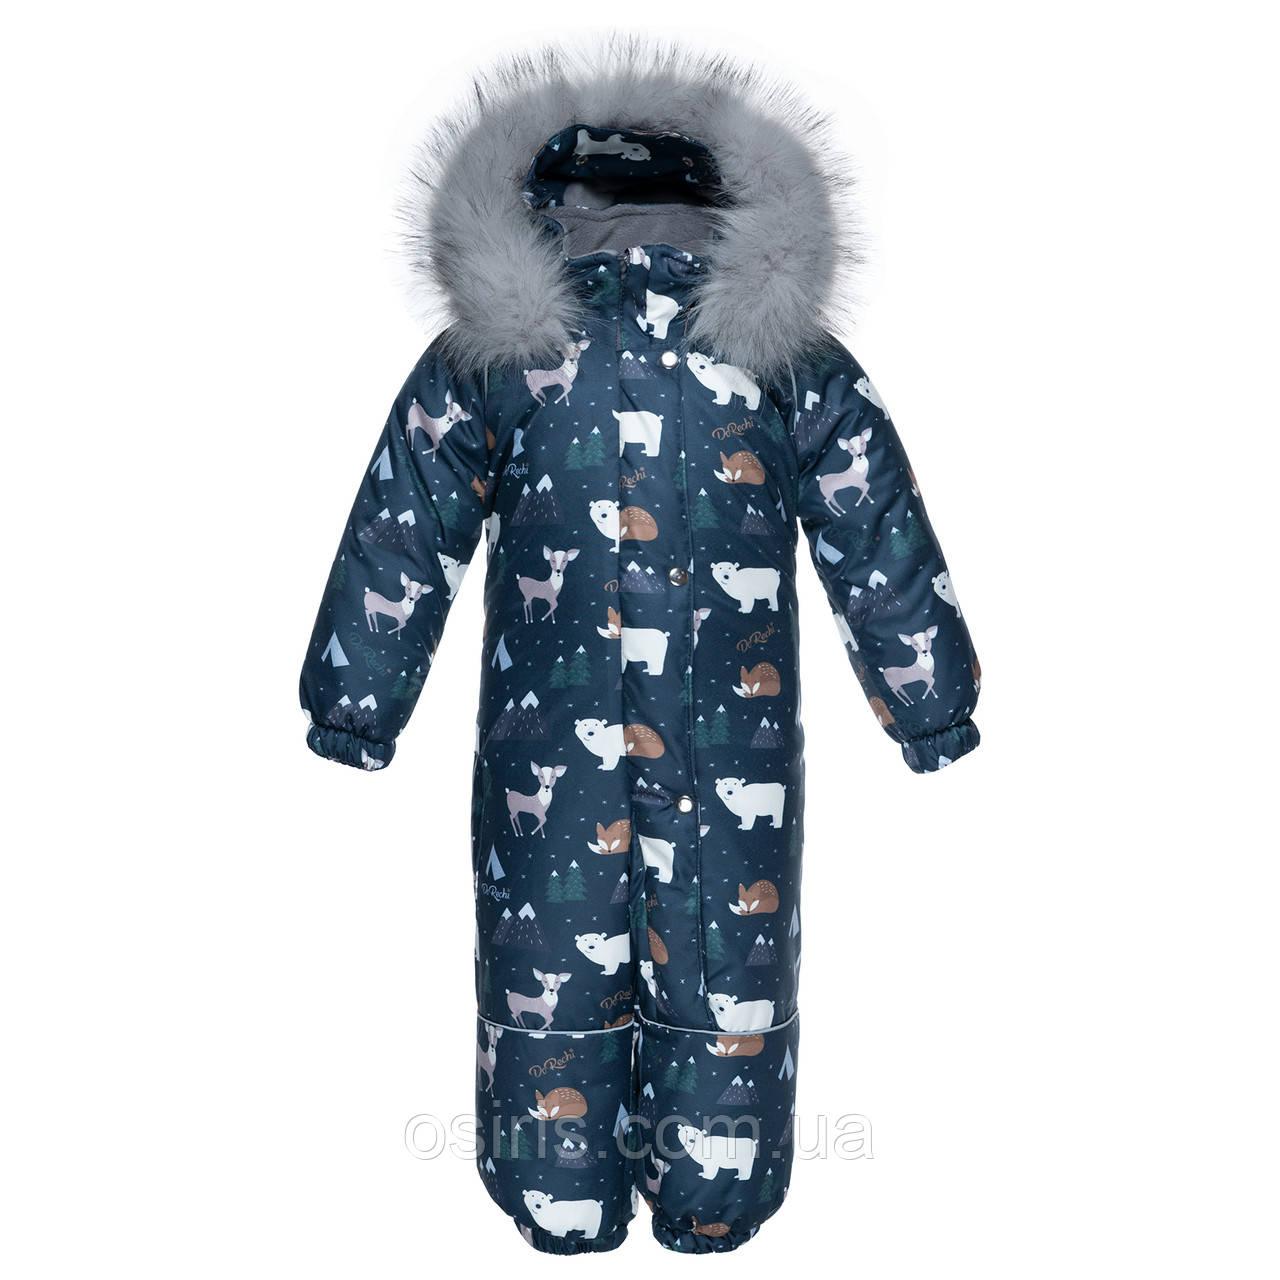 Комбинезон зимний детский Apollo Синяя Арктика с Опушкой / Детские зимние комбинезоны